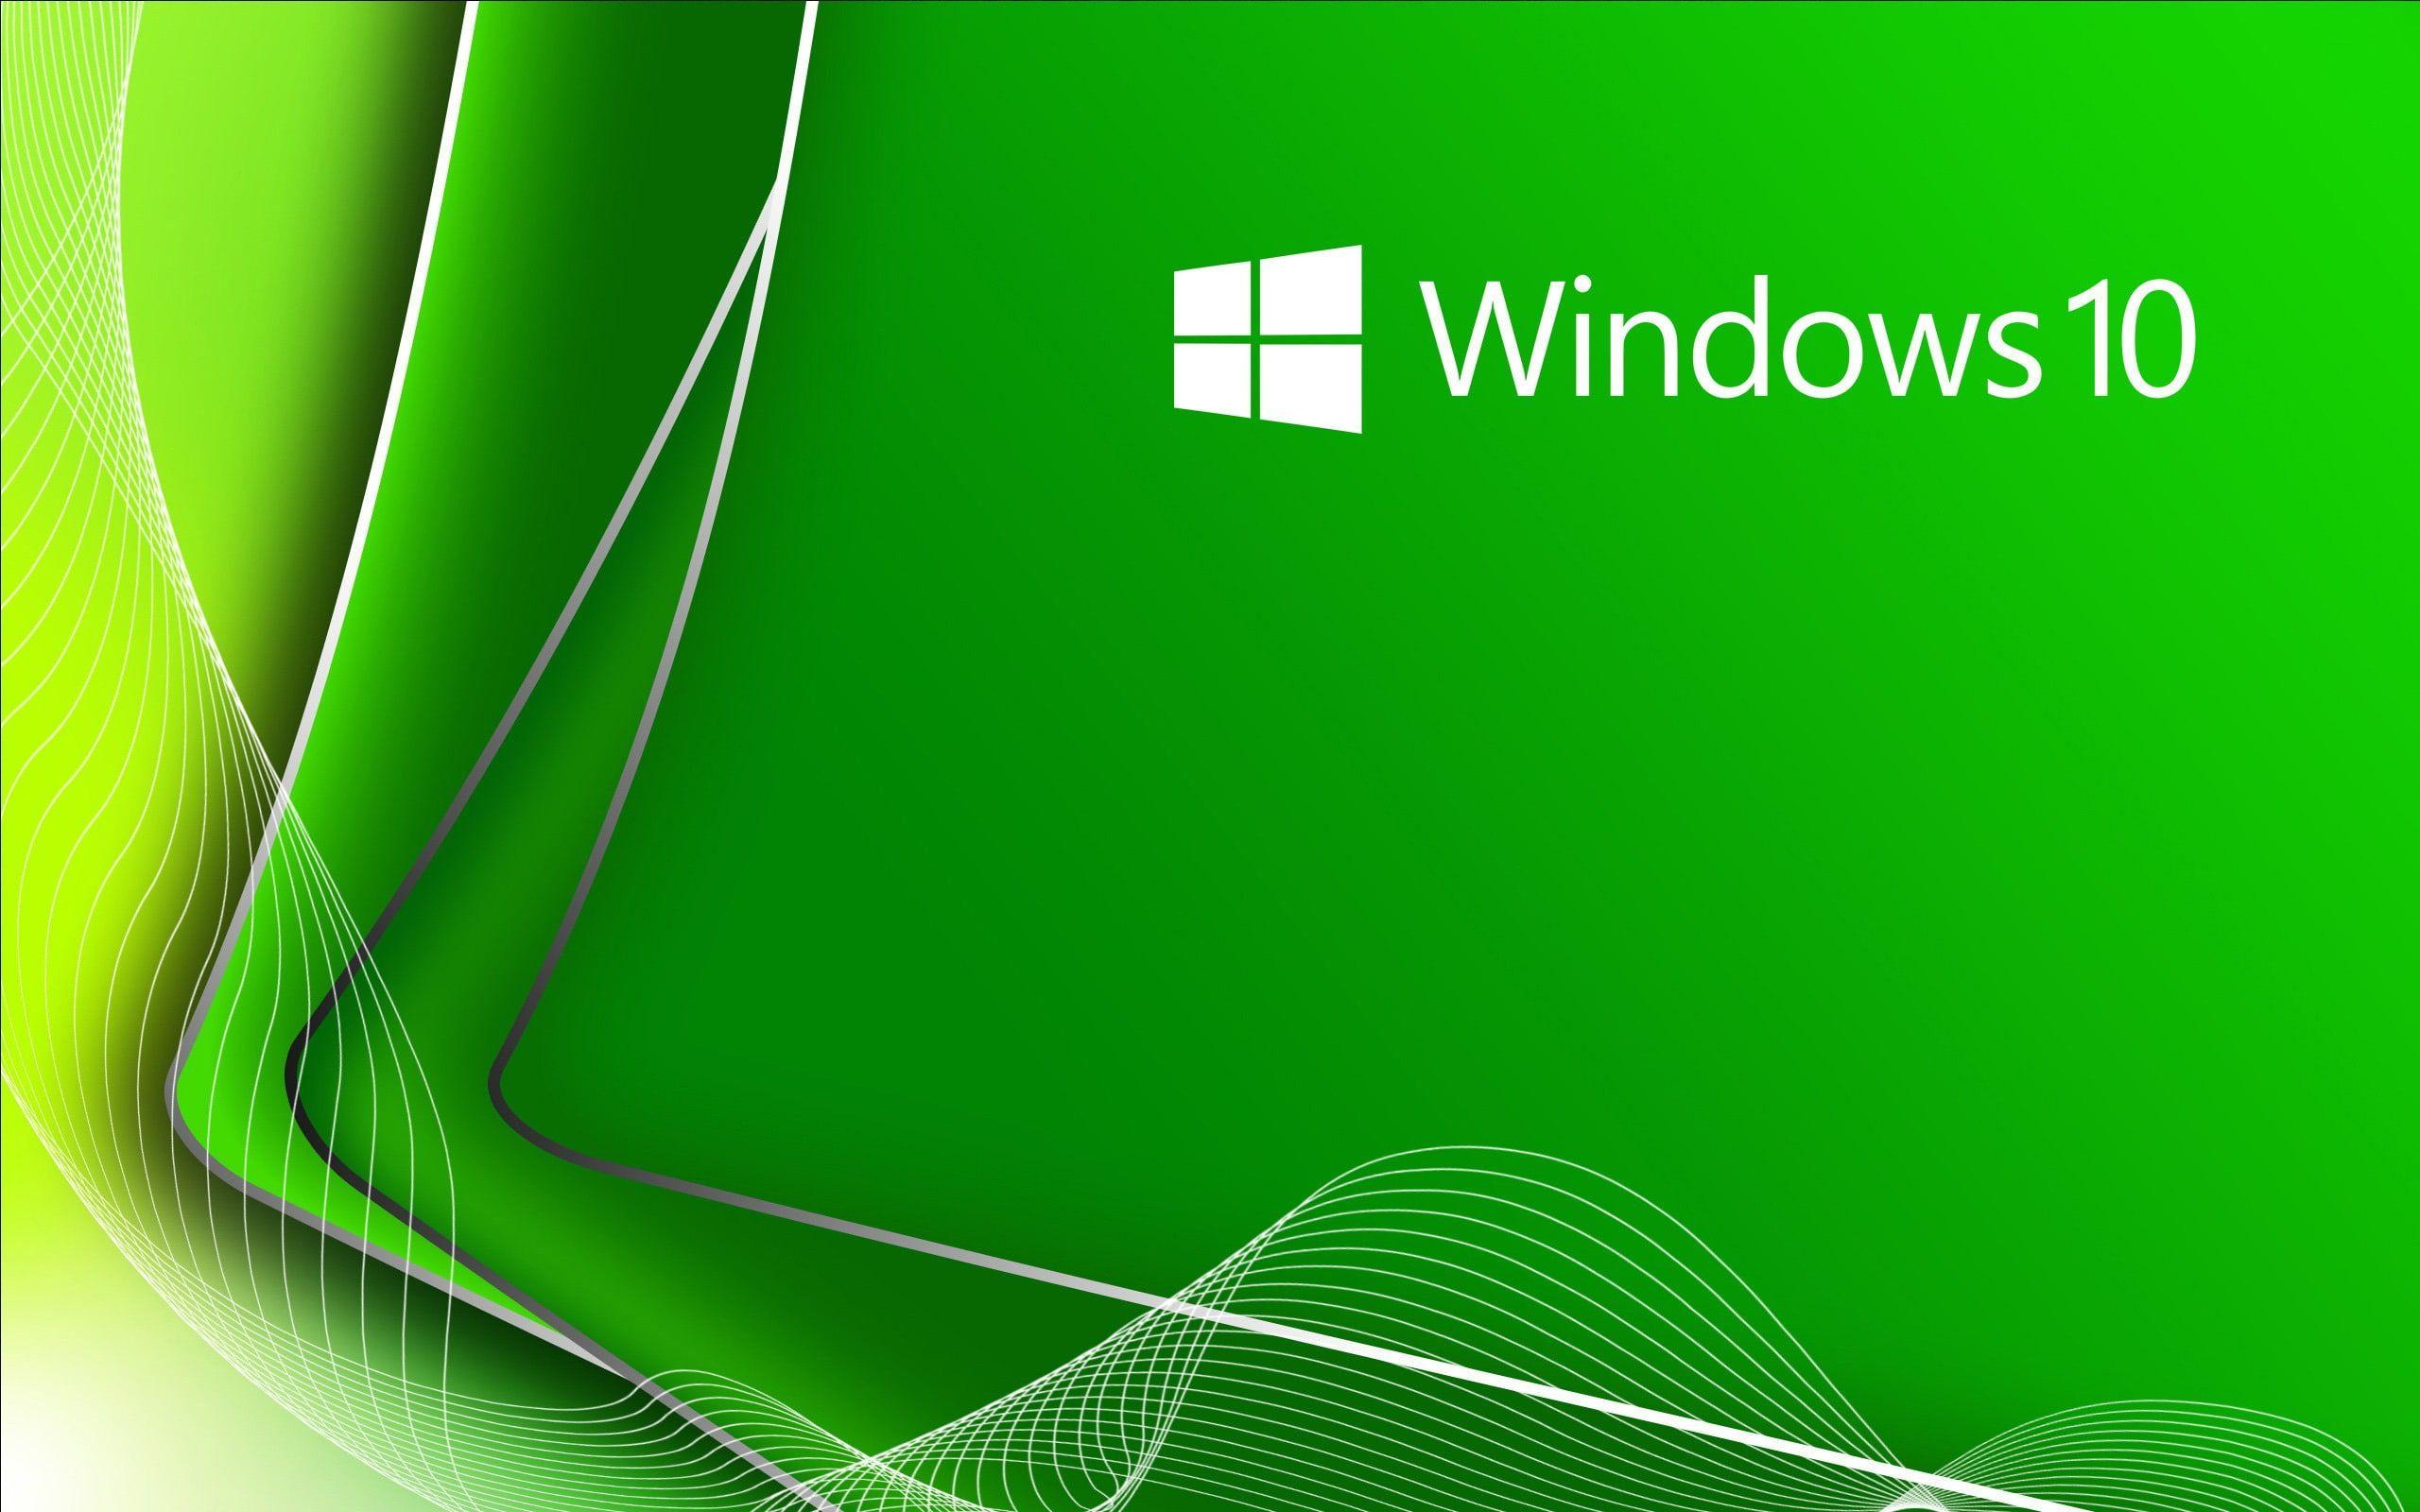 Windows 10 Microsoft Windows Operating System Logo Purple Violet 1080p Wallpaper H Microsoft Windows Operating System Microsoft Windows Windows Wallpaper